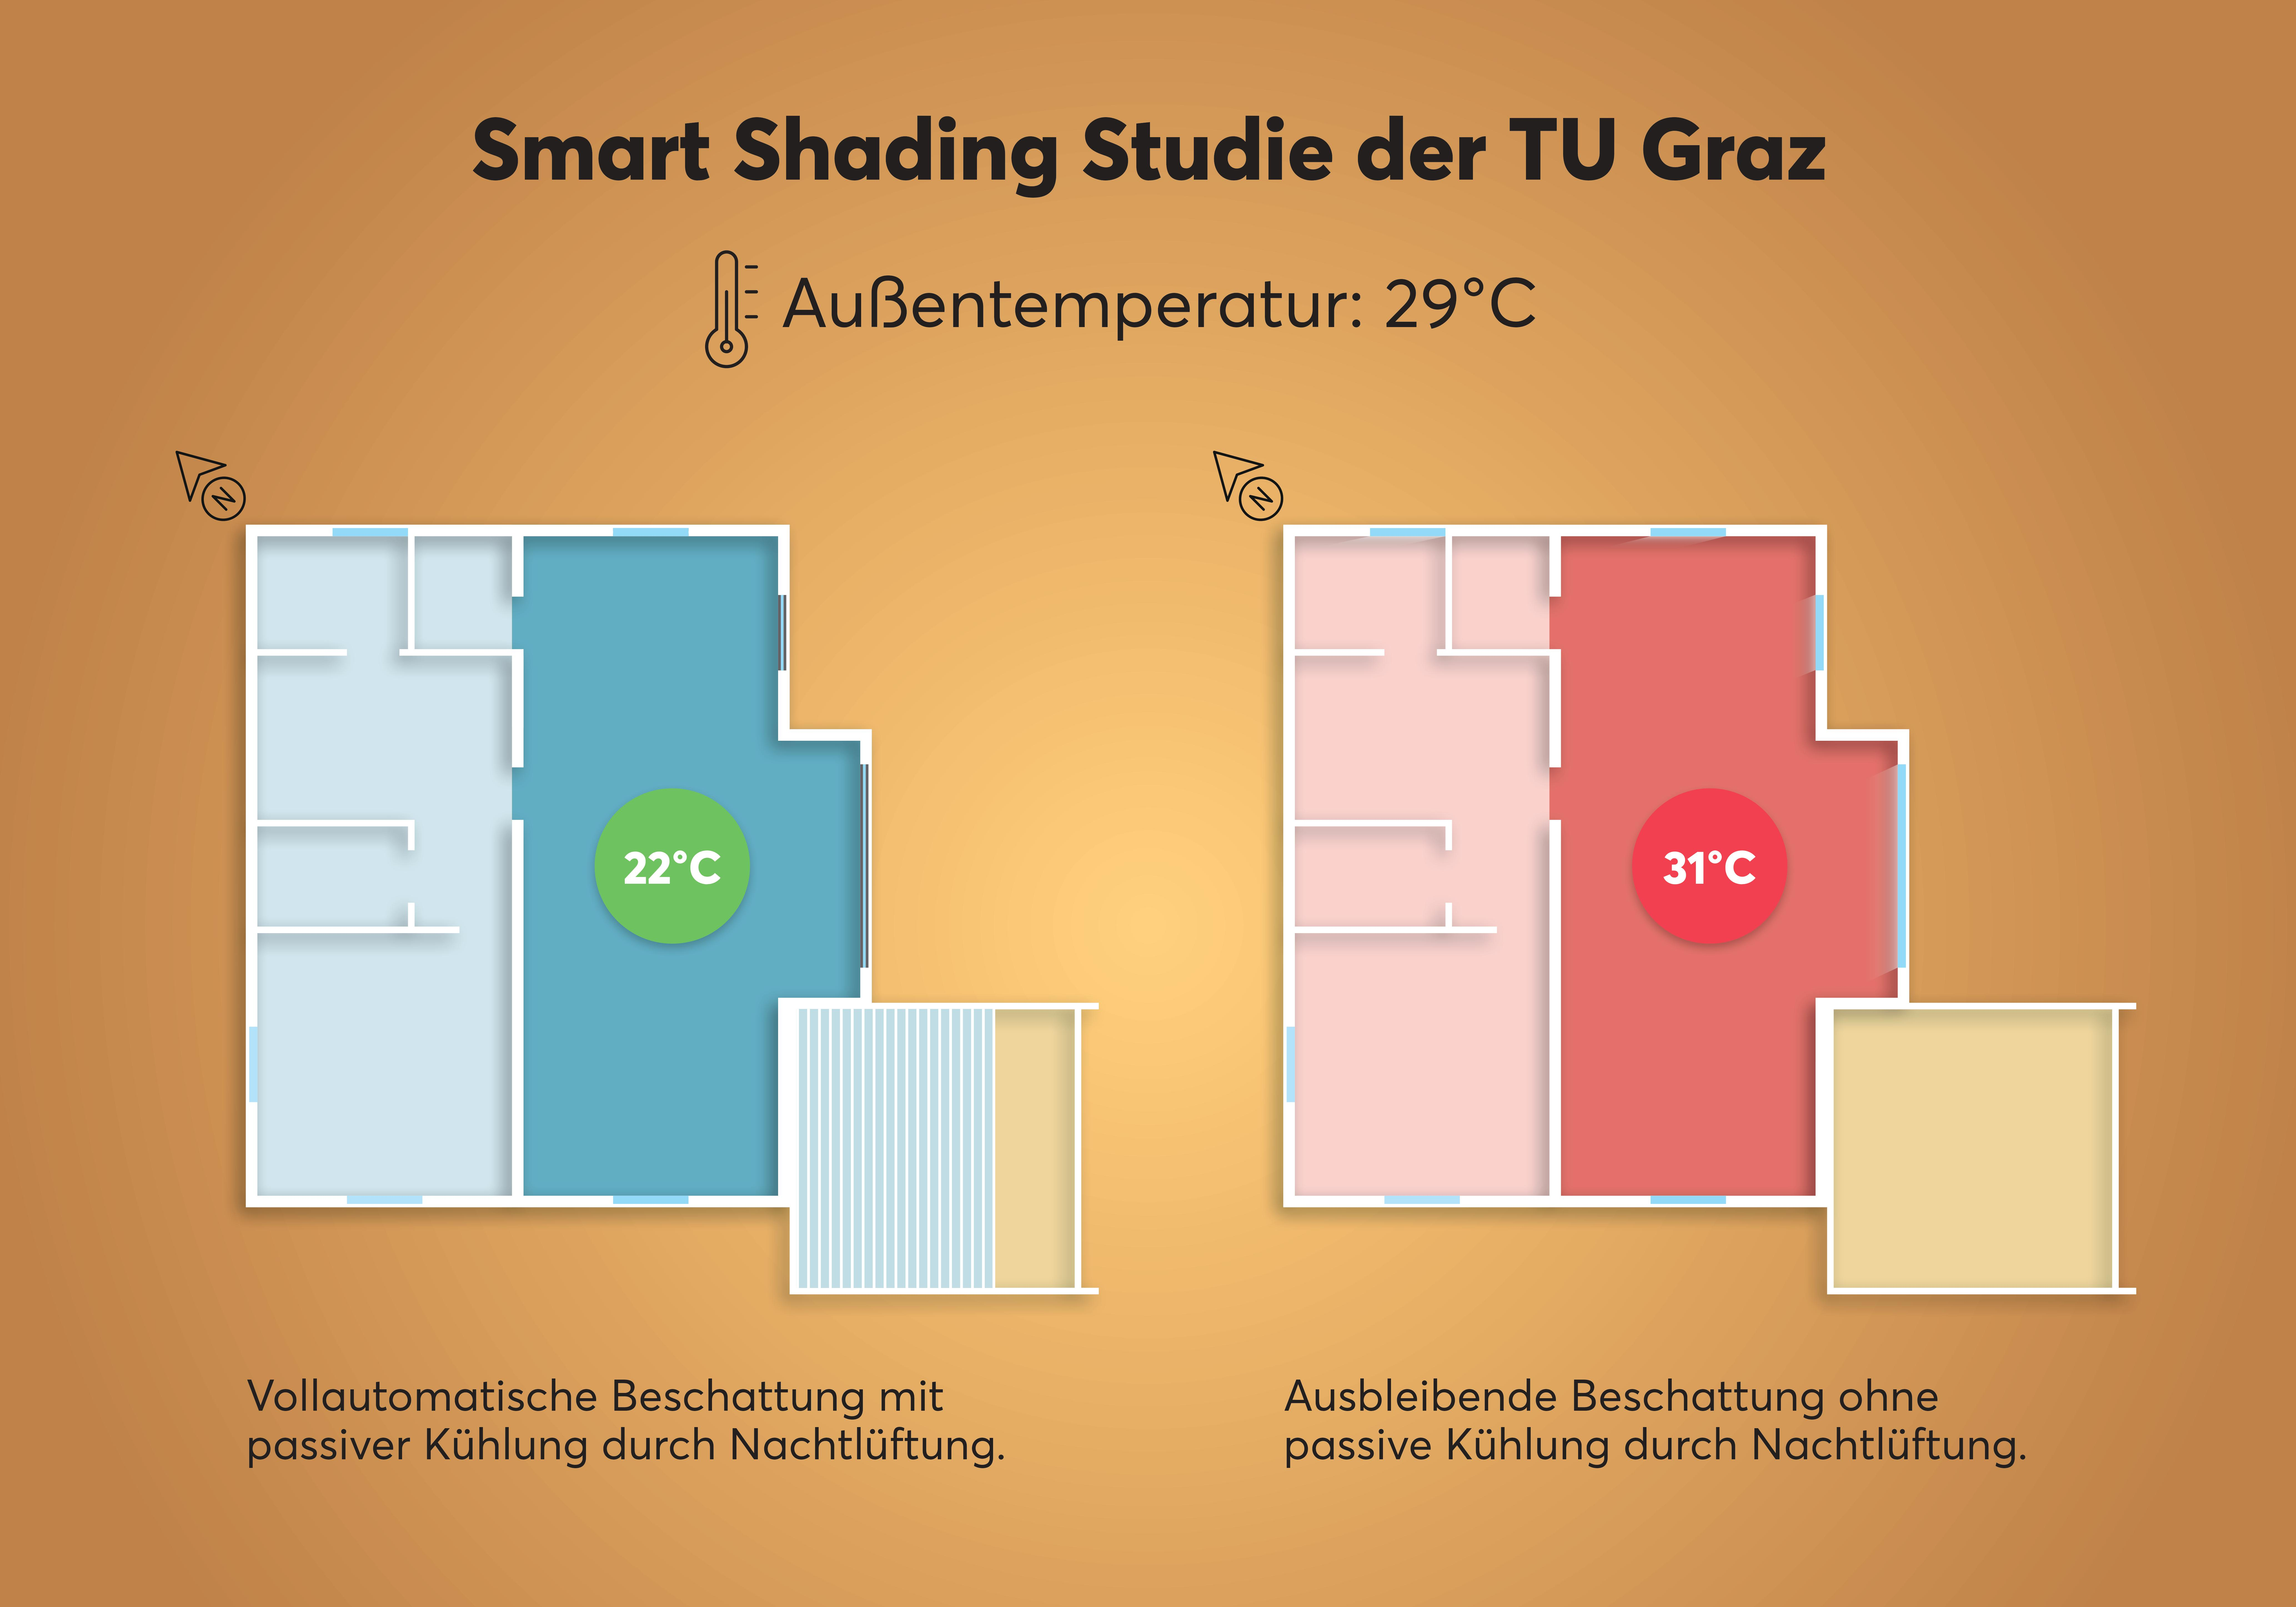 Smart Shading Studie